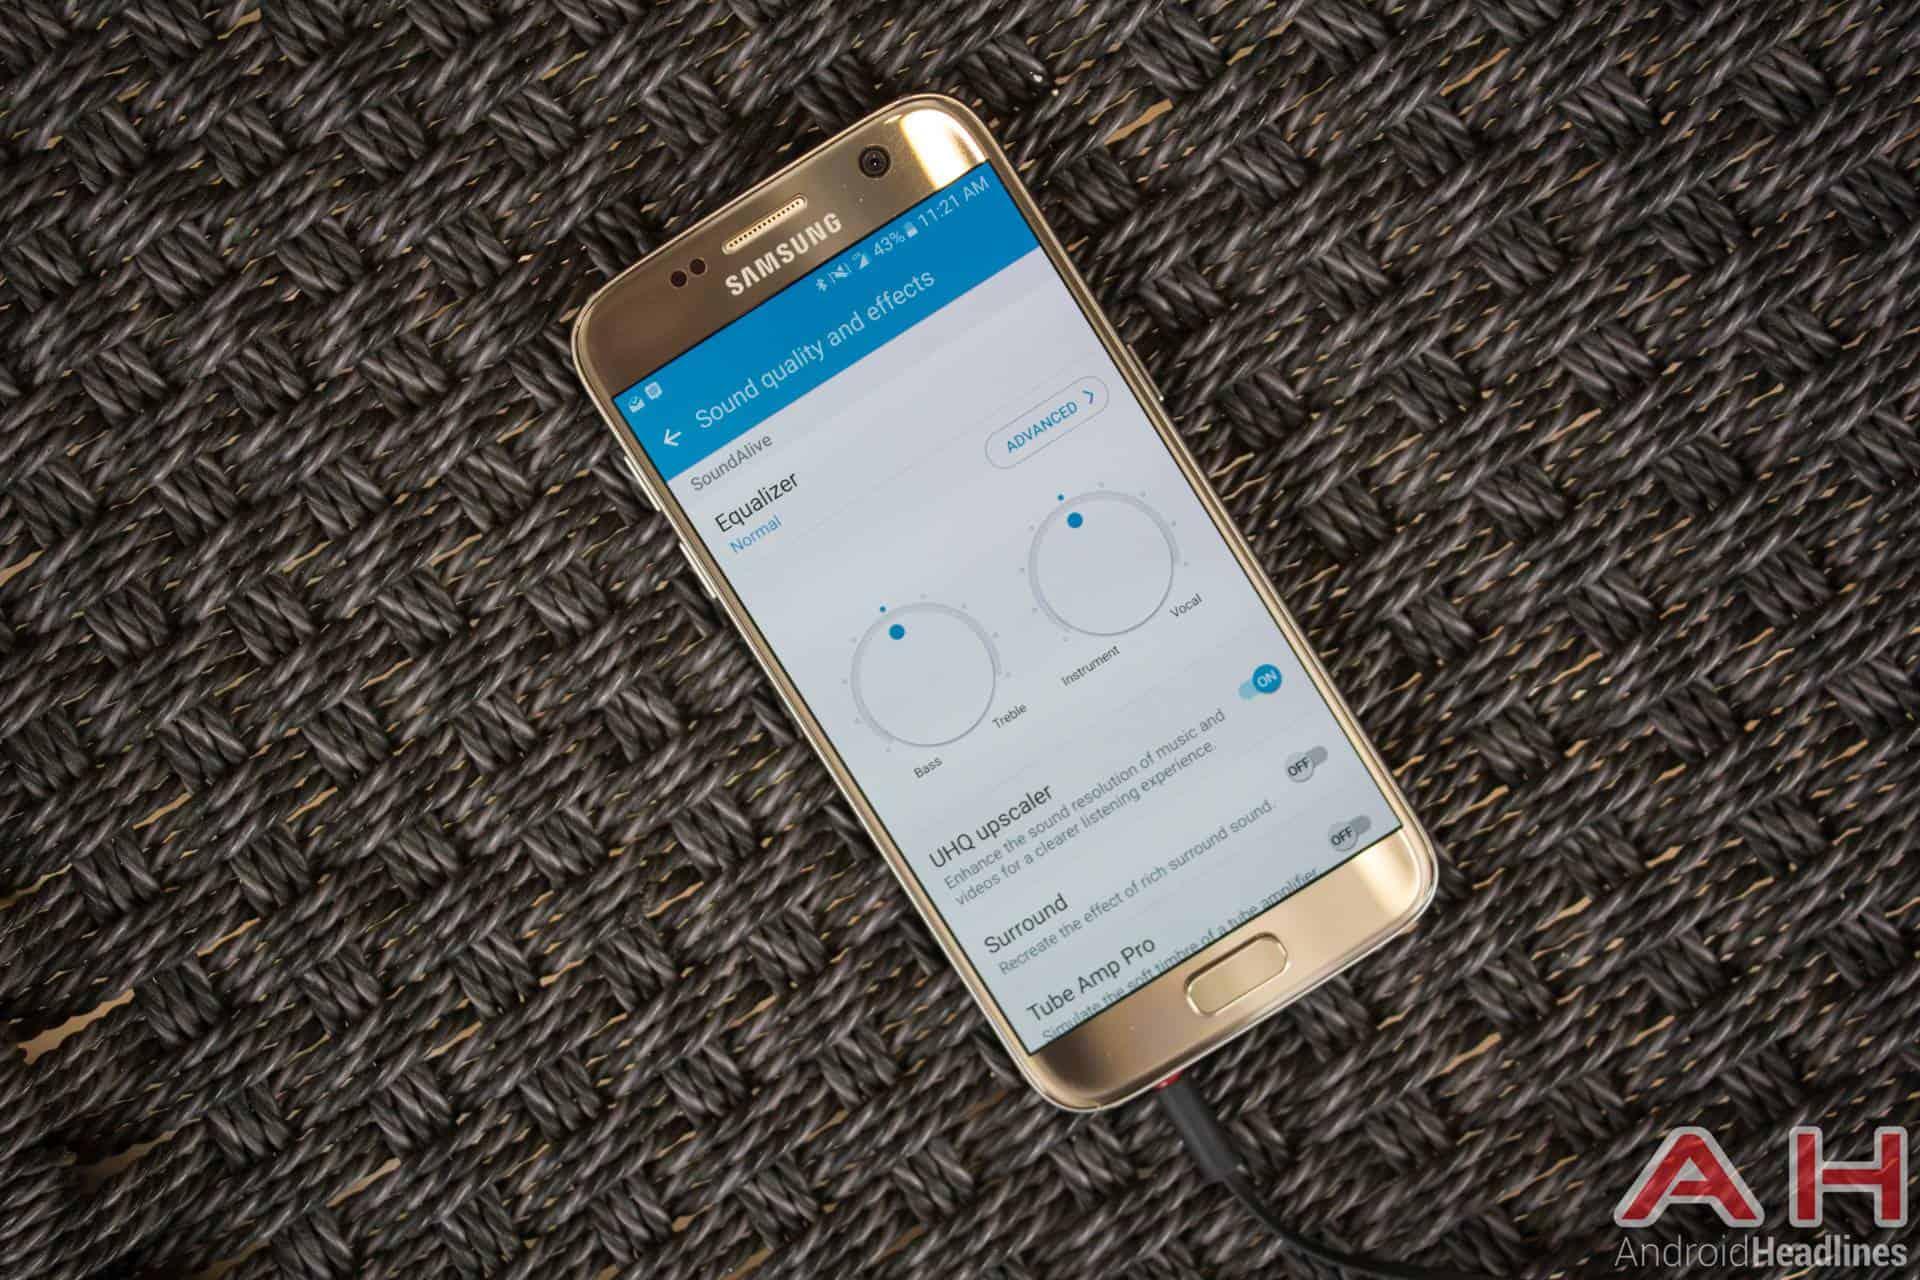 Samsung Galaxy S7 Gold AH NS audio equalizer